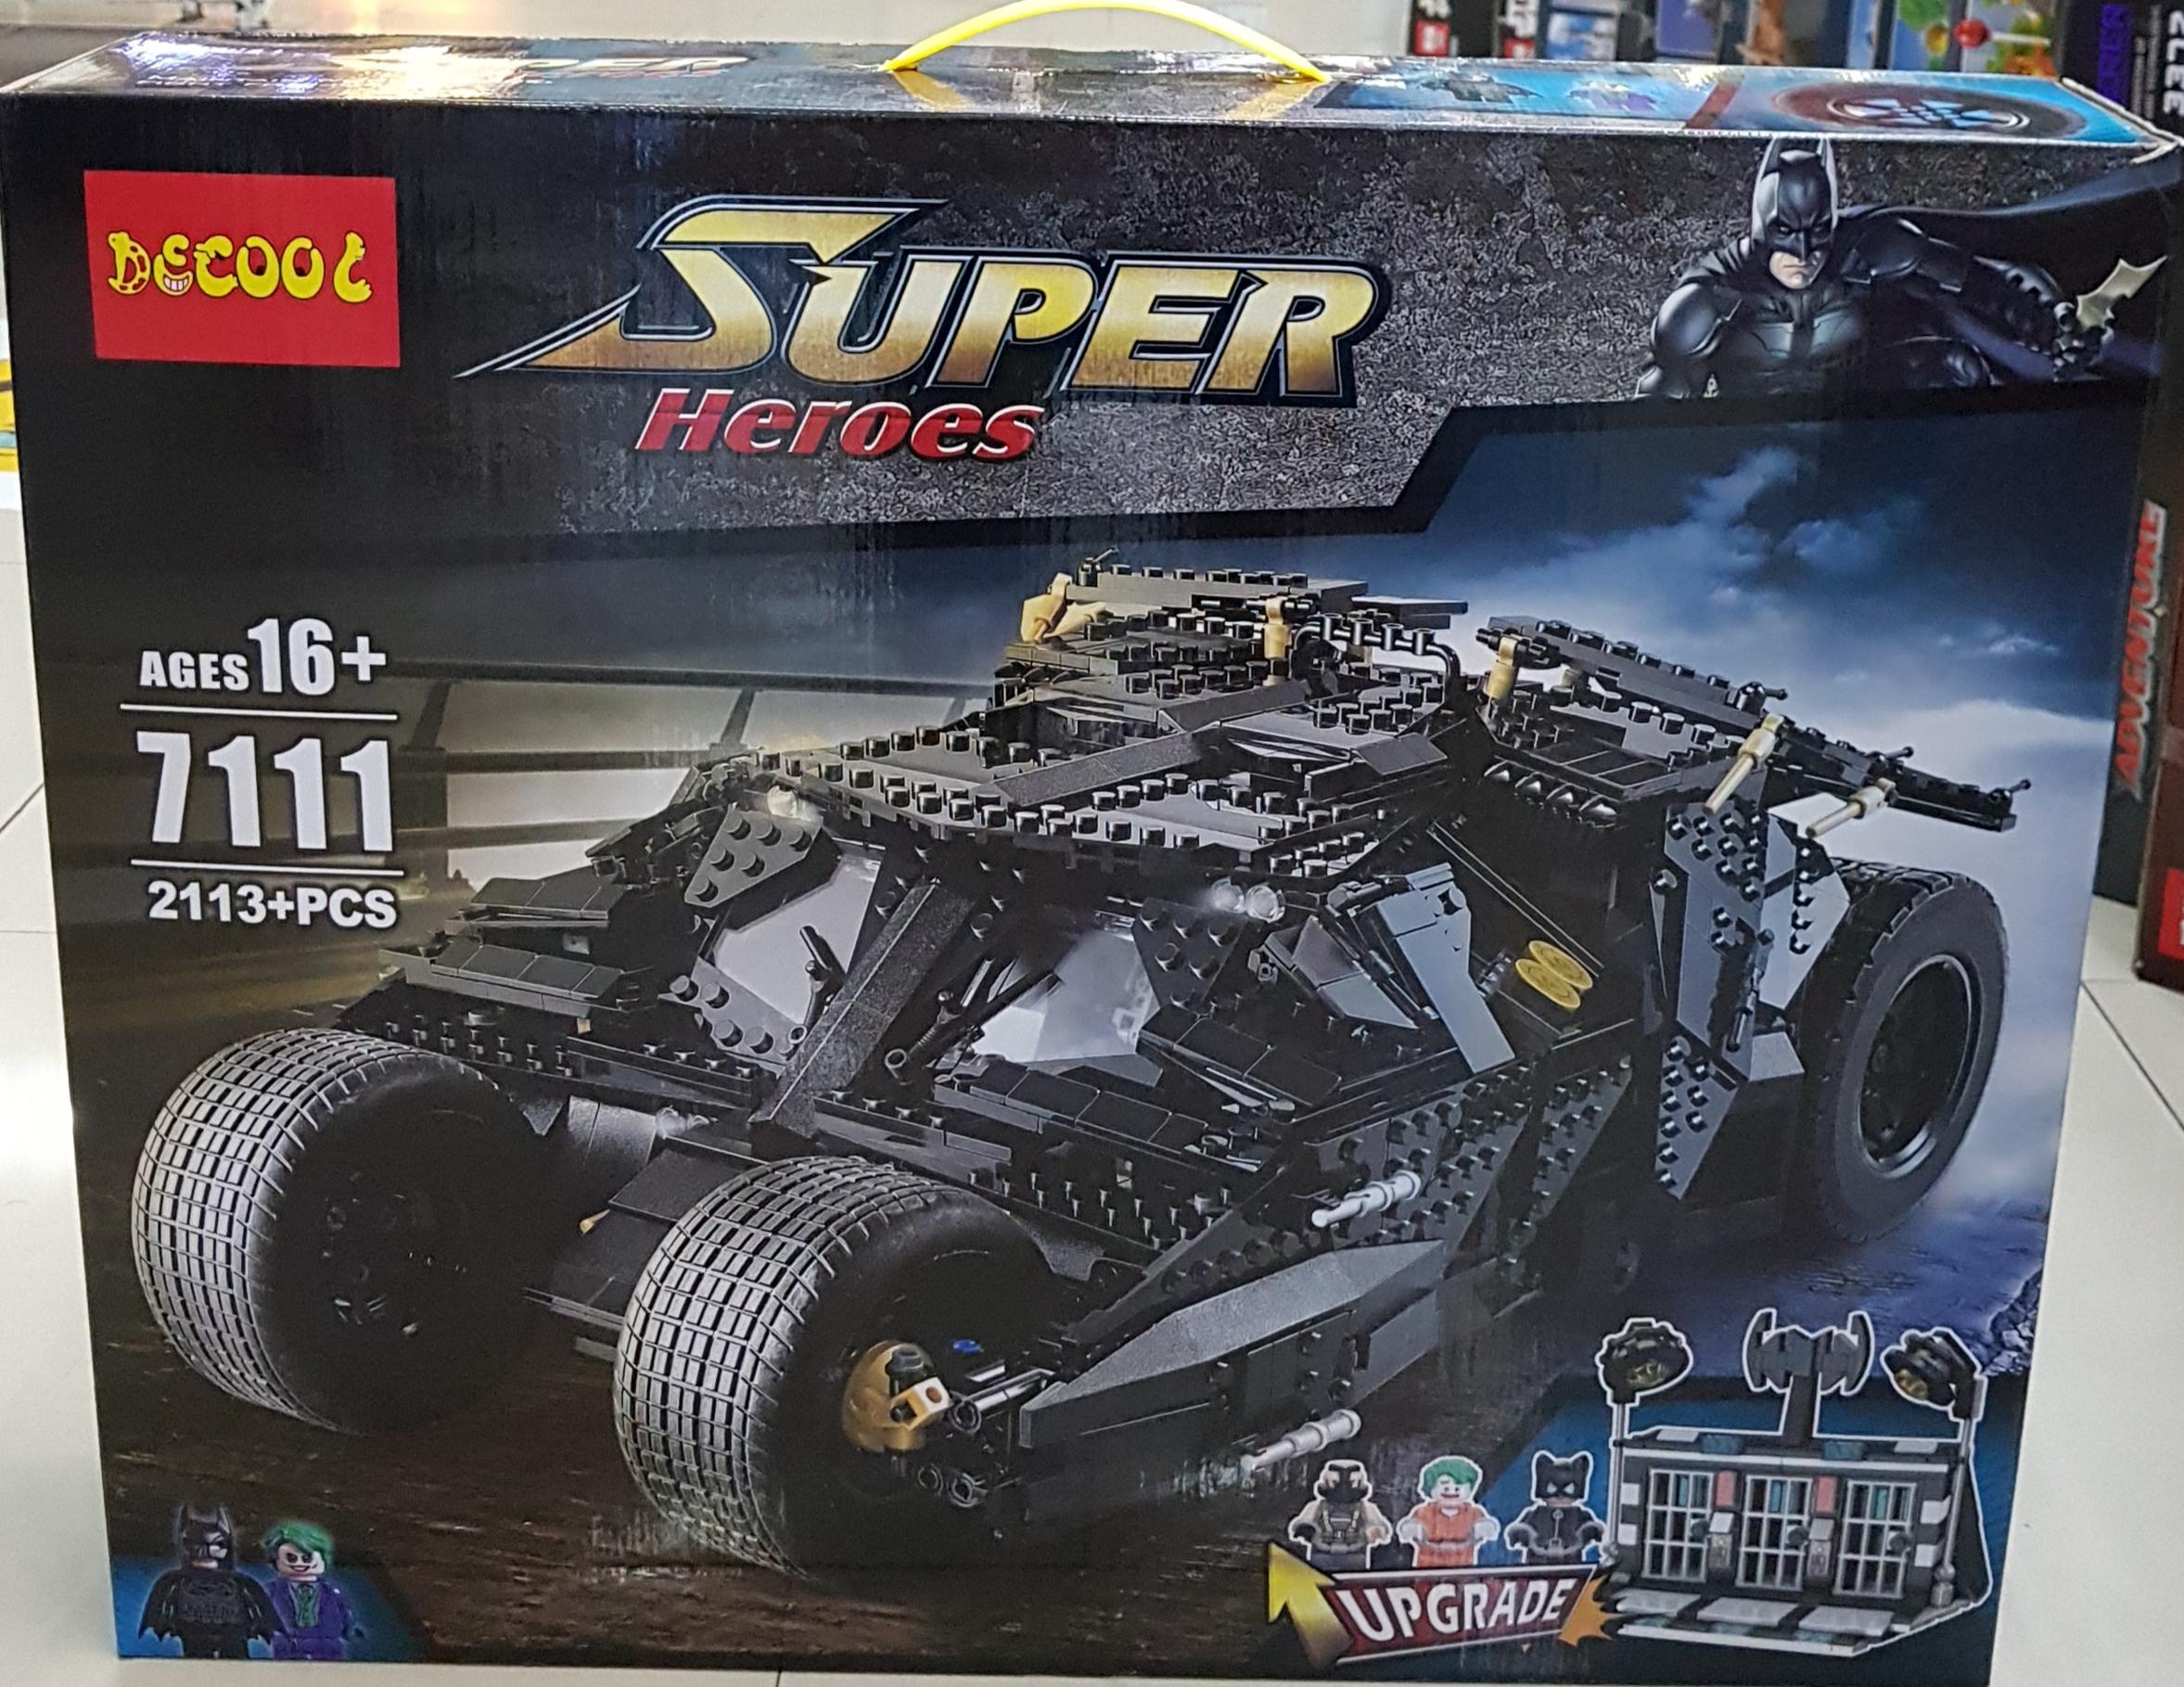 DECOOL SUPER HEROES 7111 [2113+ชิ้น]